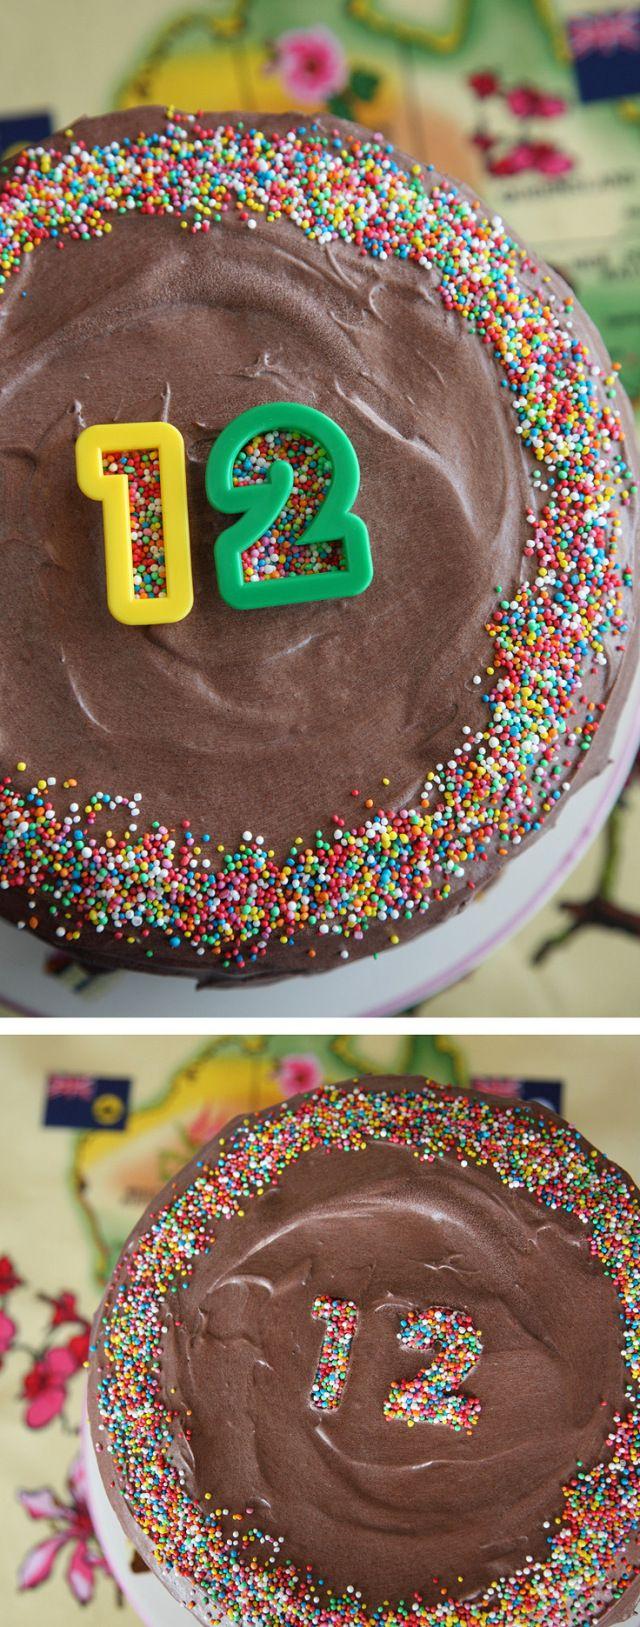 01Feb2015 Food Design: How to Make a Pinata Cake categories: Food Design, Photography, Portfolio, Styling